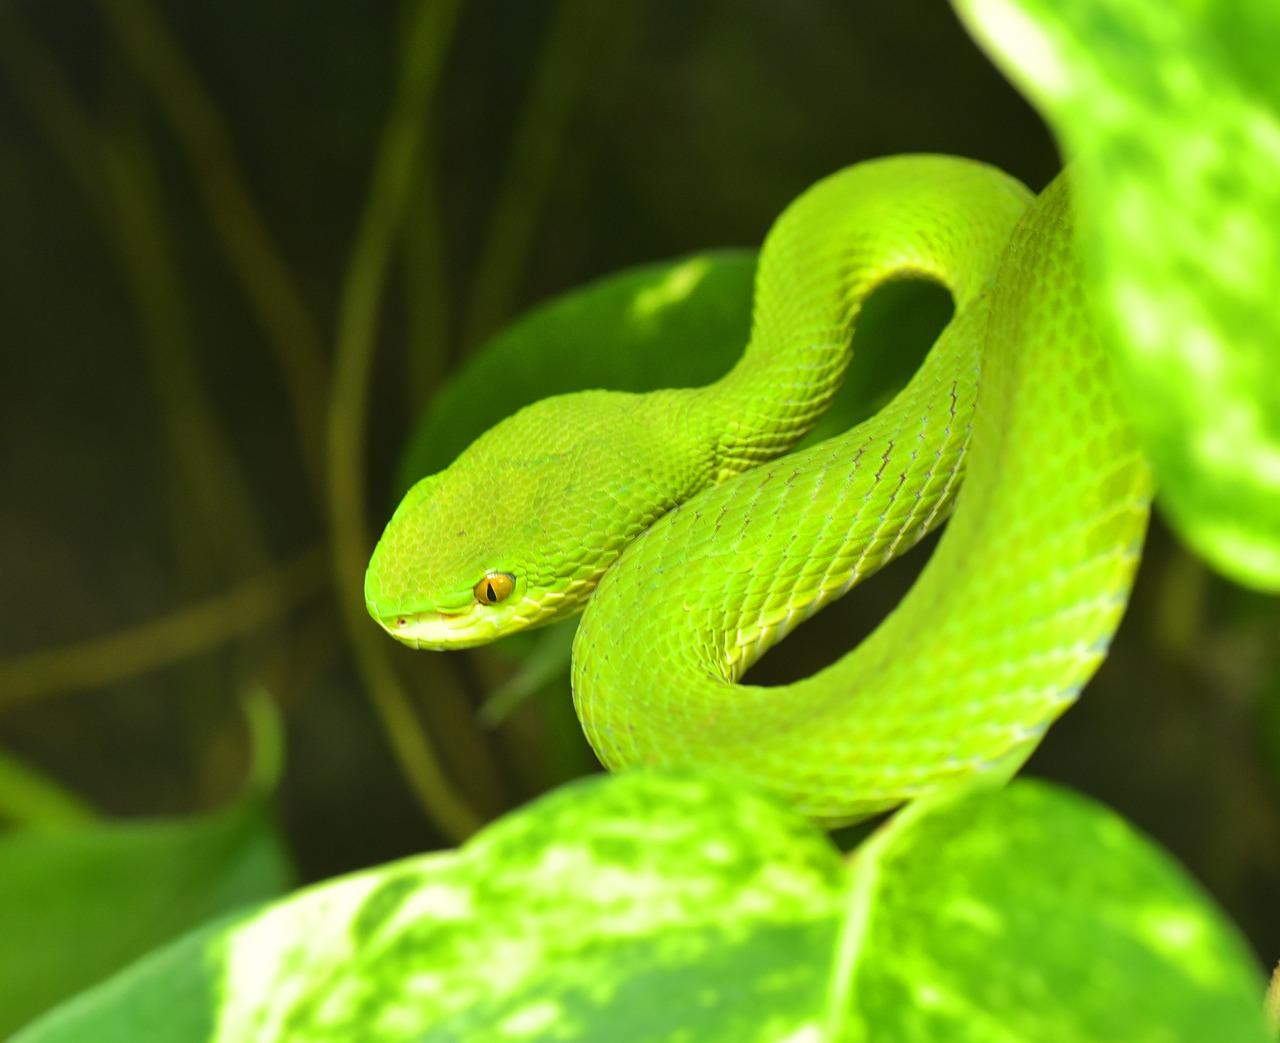 Green Bush Viper Atheris - Free photo on Pixabay